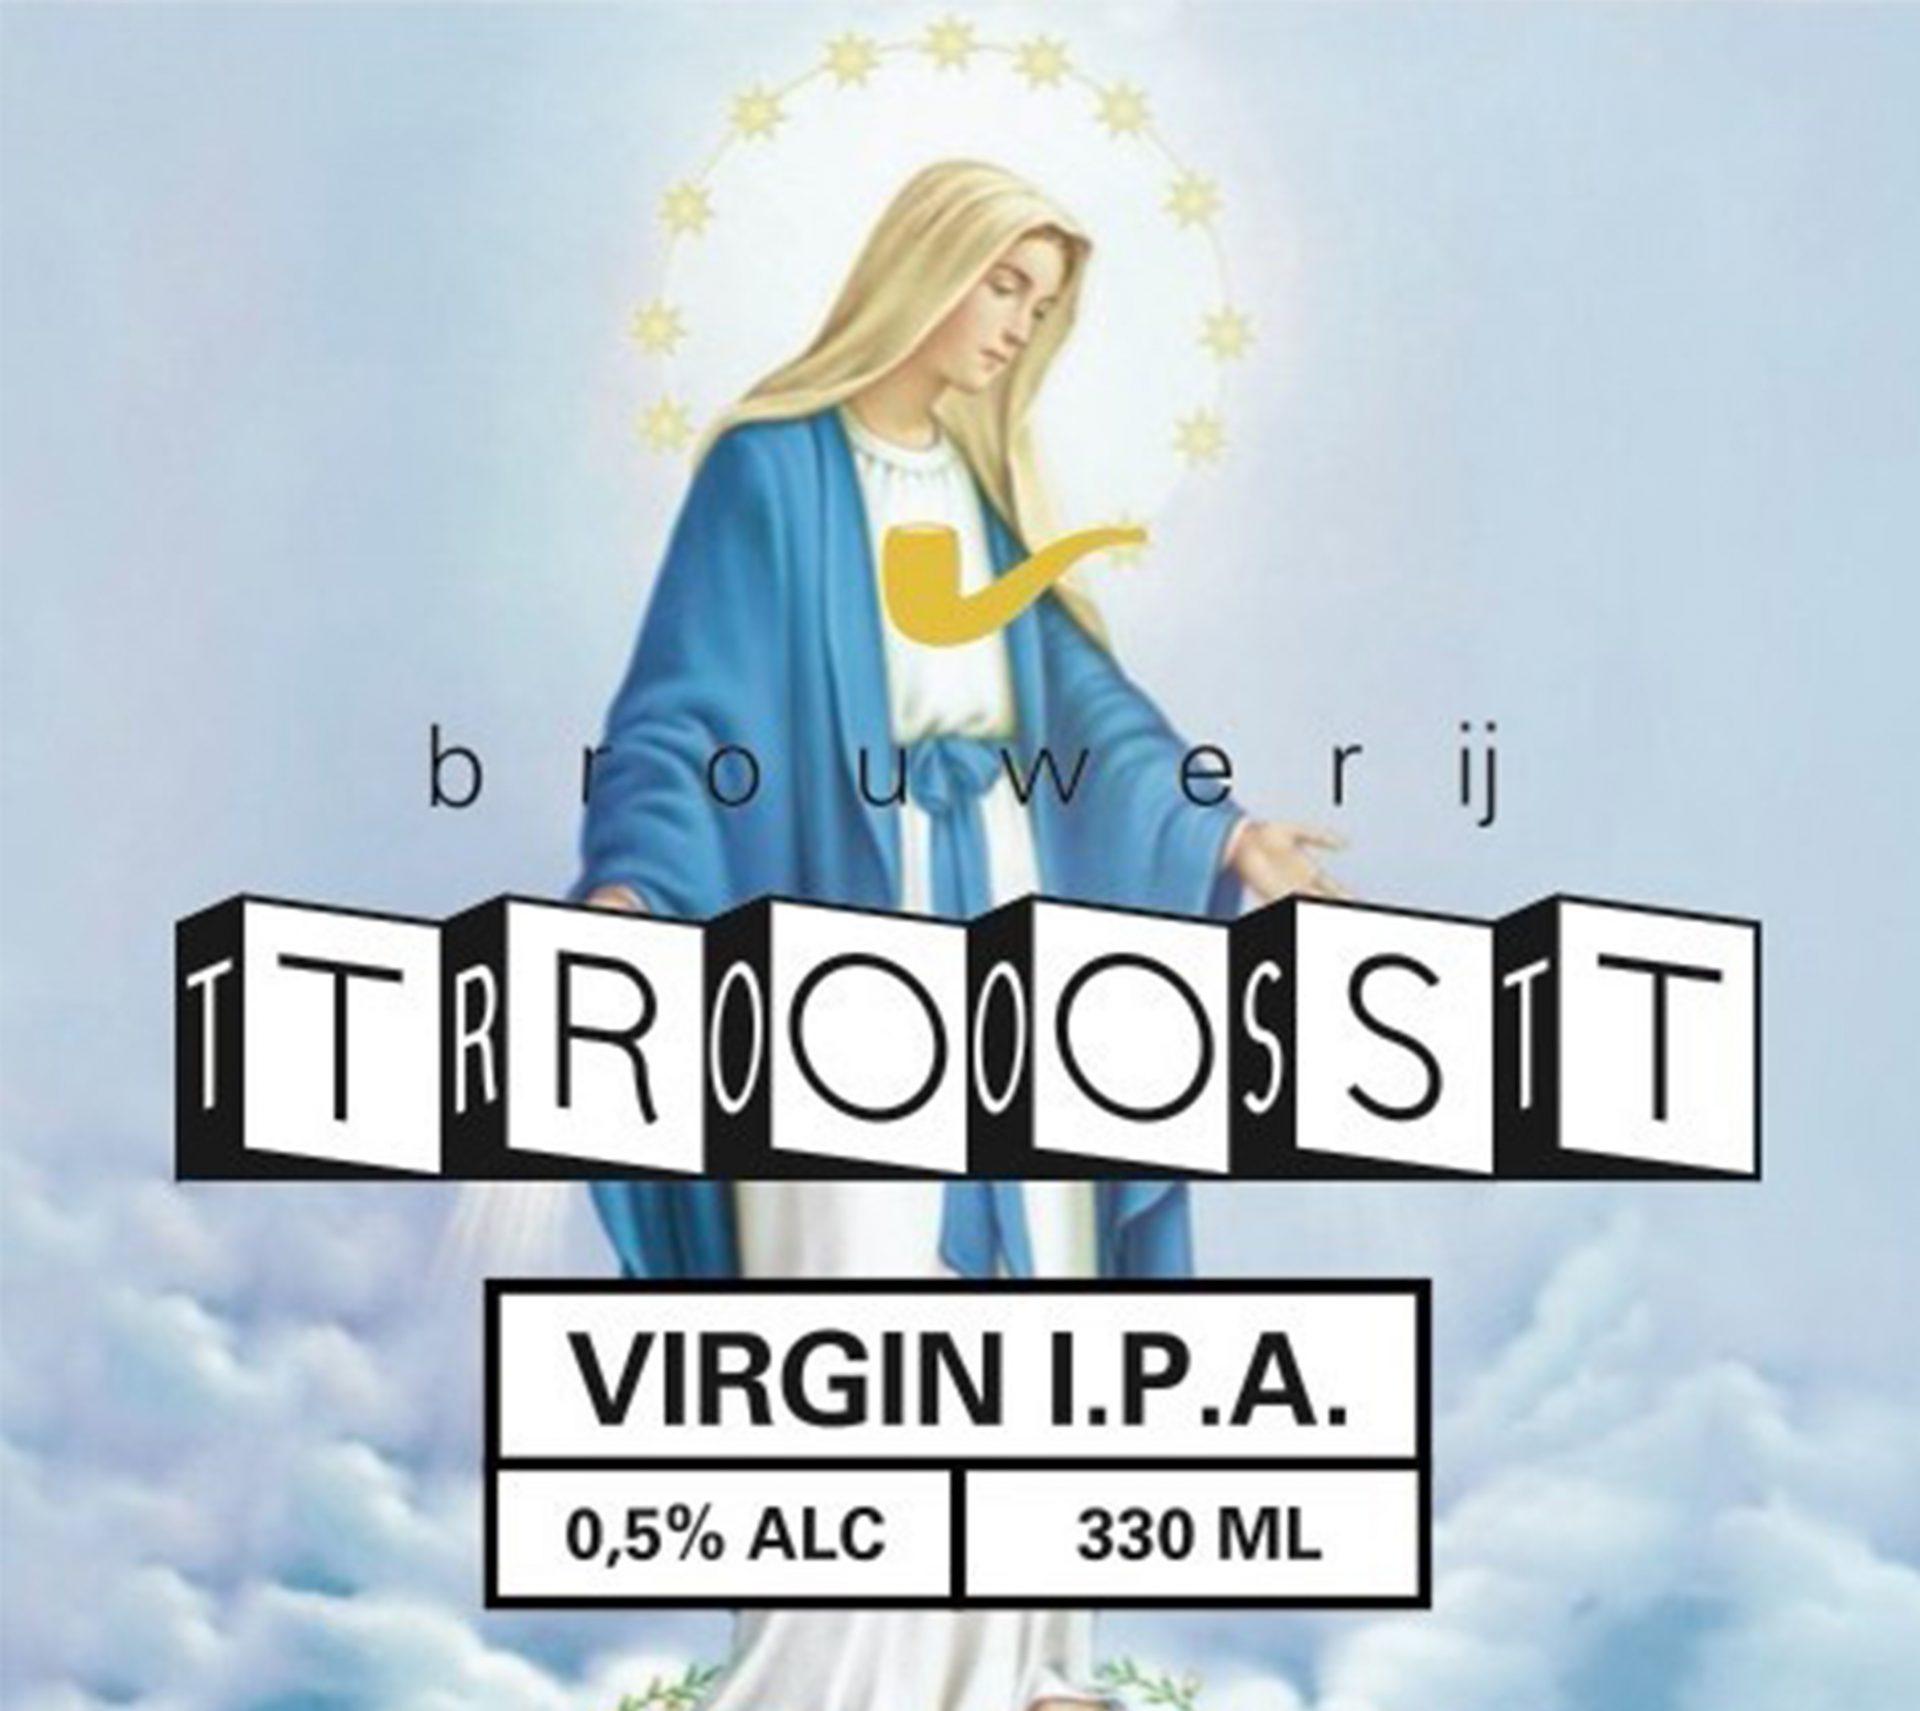 Nieuwsbrief-Nectar-Utrecht-Lentebier-Troost-Lentebier-02